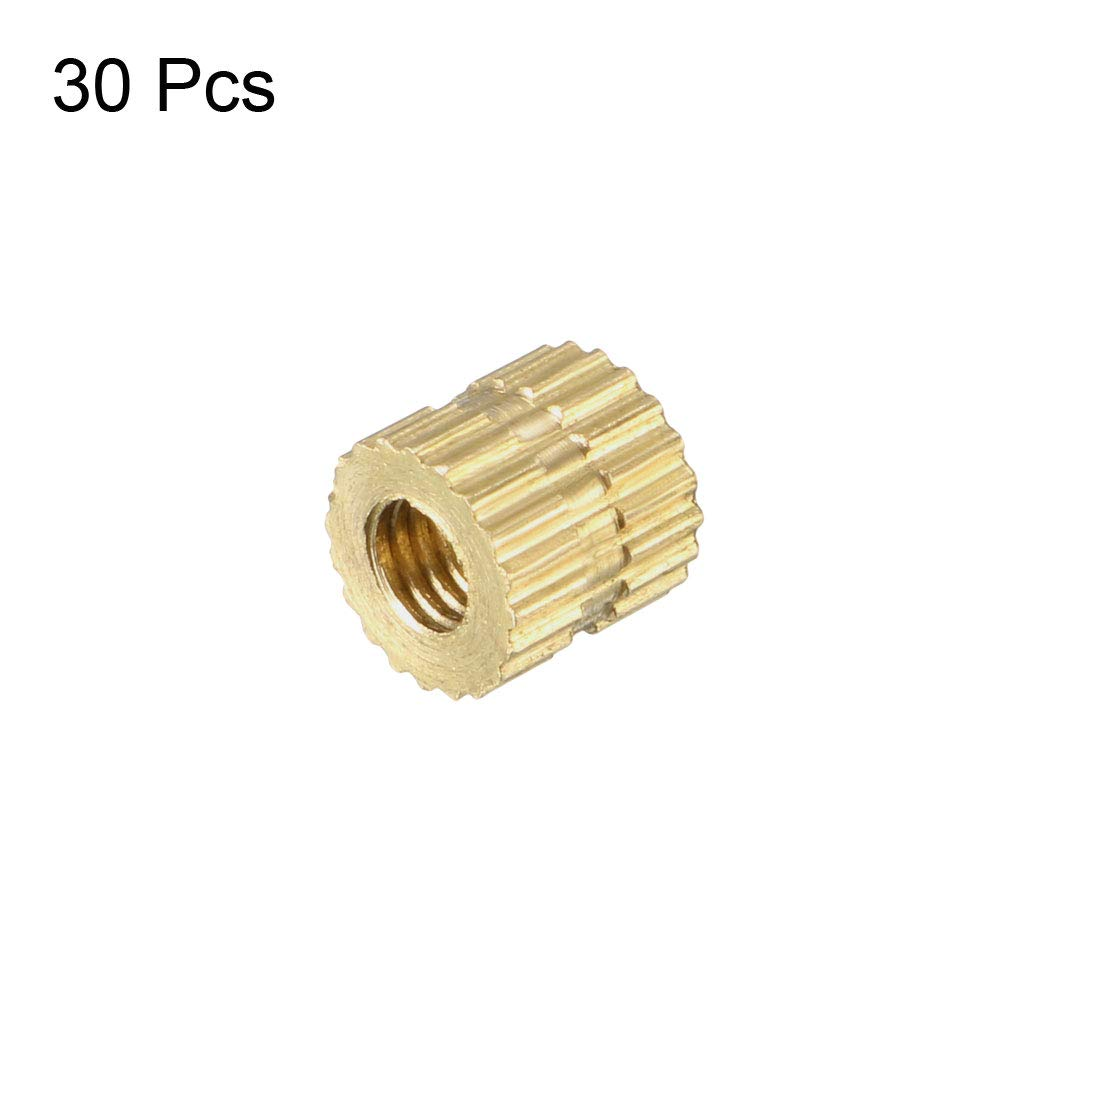 x 8mm Female Thread Brass Embedment Nuts uxcell Knurled Threaded Insert L OD Pack of 10 1//4-20 x 6mm